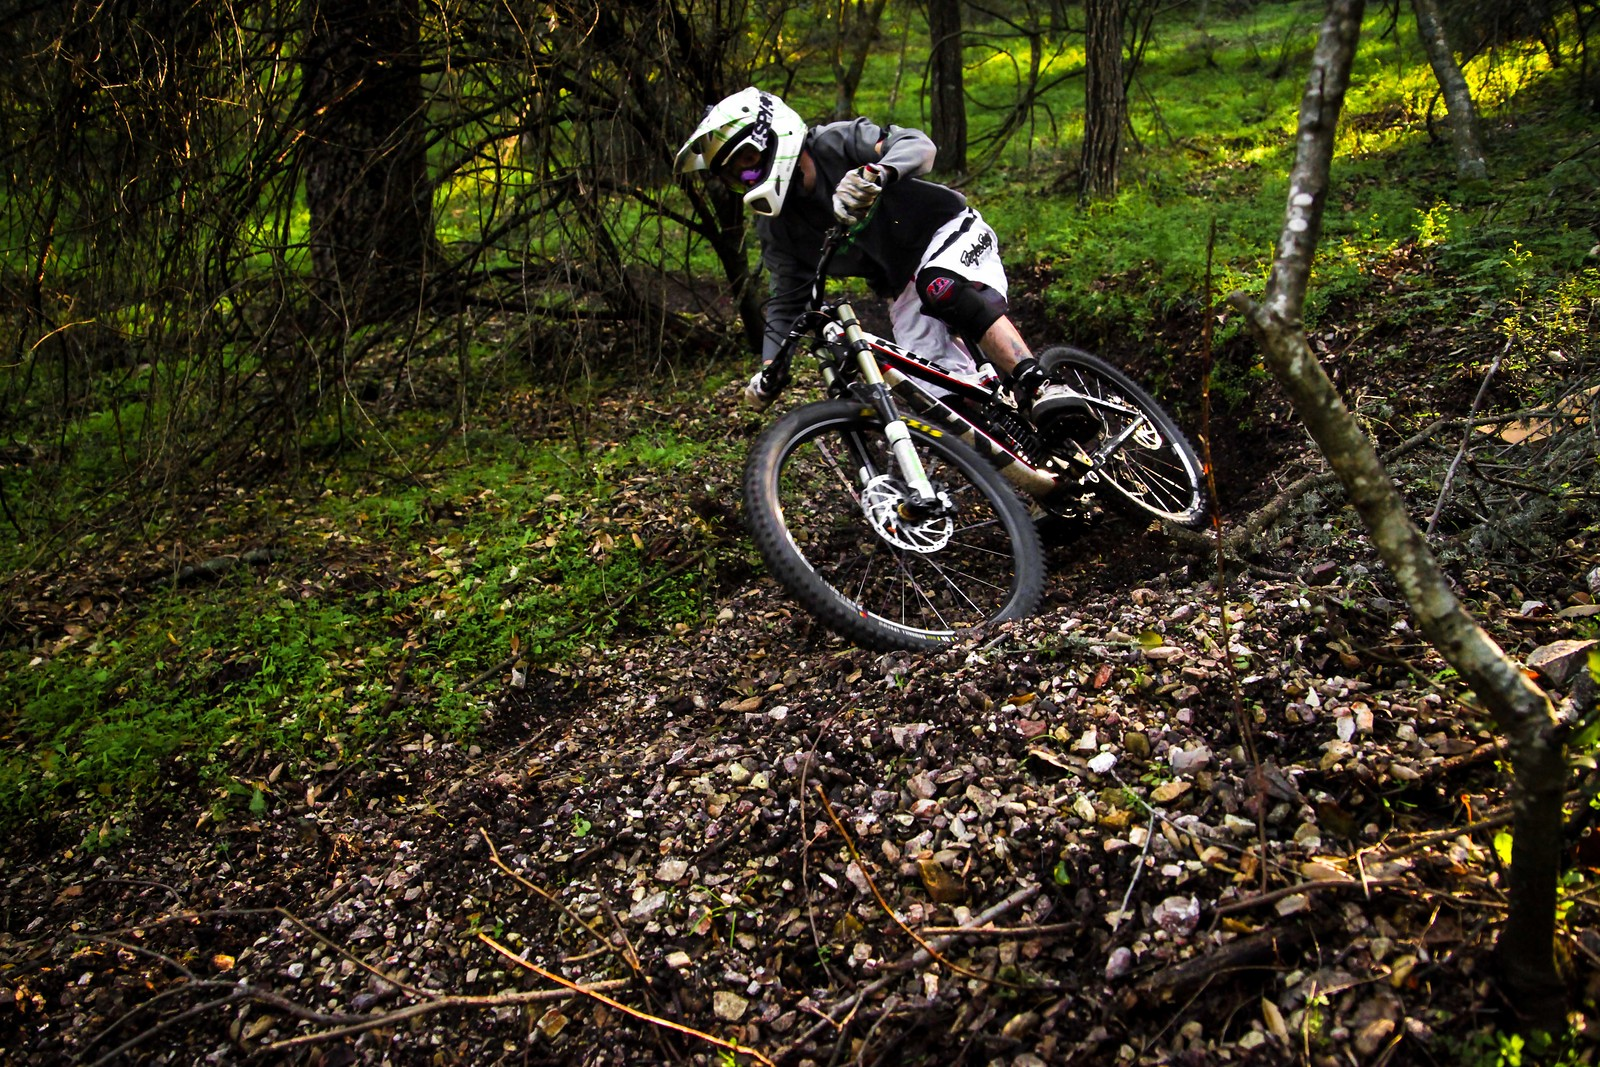 IMG 2653 - GnarHuck - Mountain Biking Pictures - Vital MTB